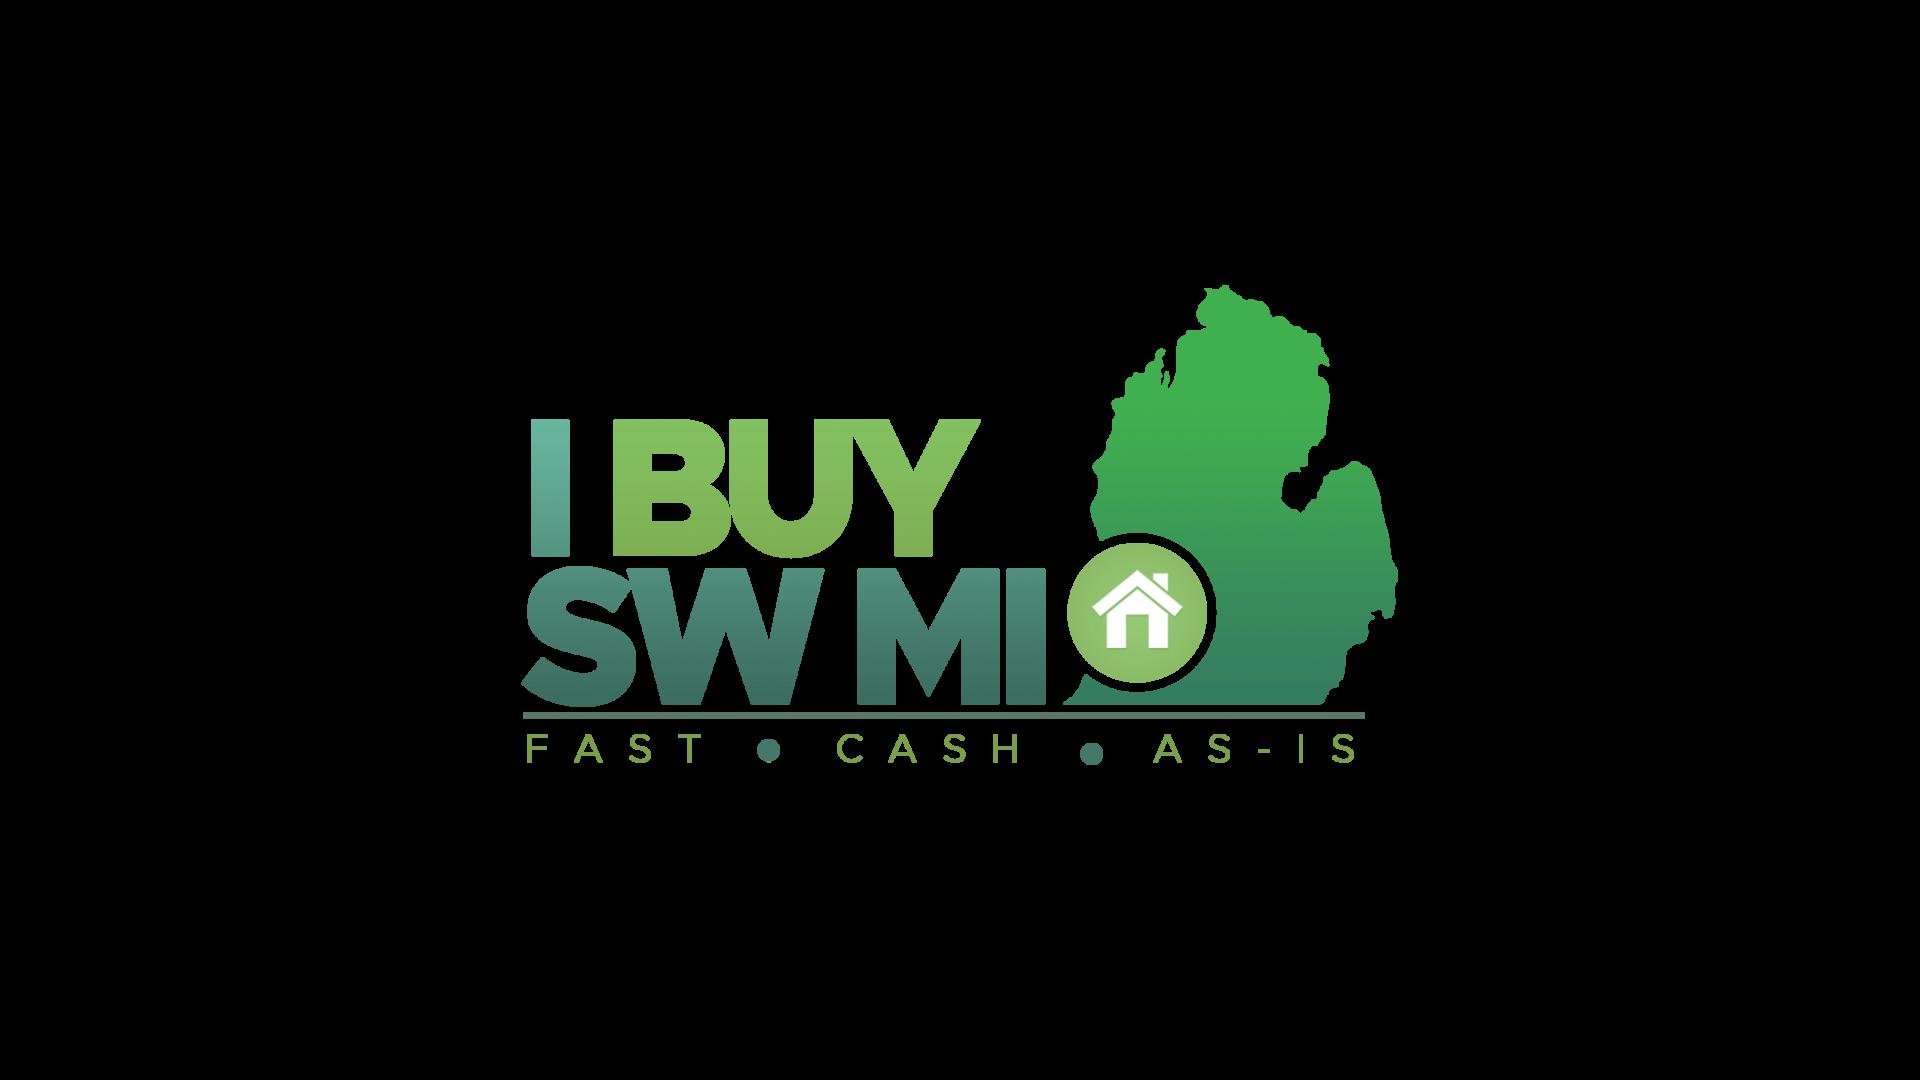 I Buy SW MI logo